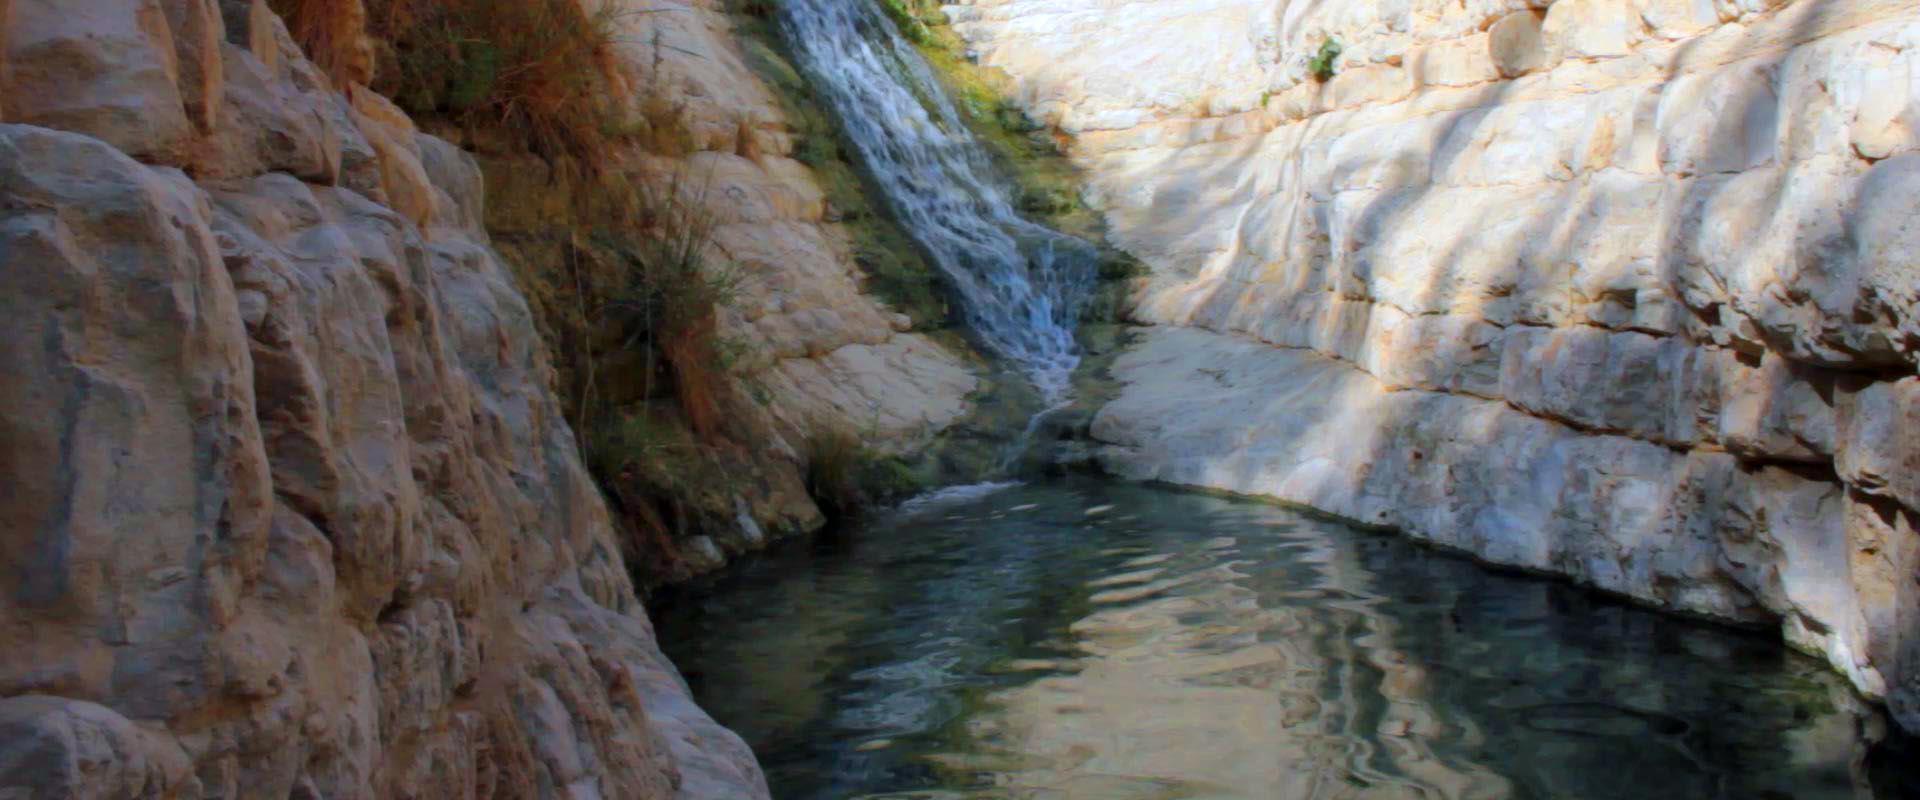 Parque nacionais de Israel